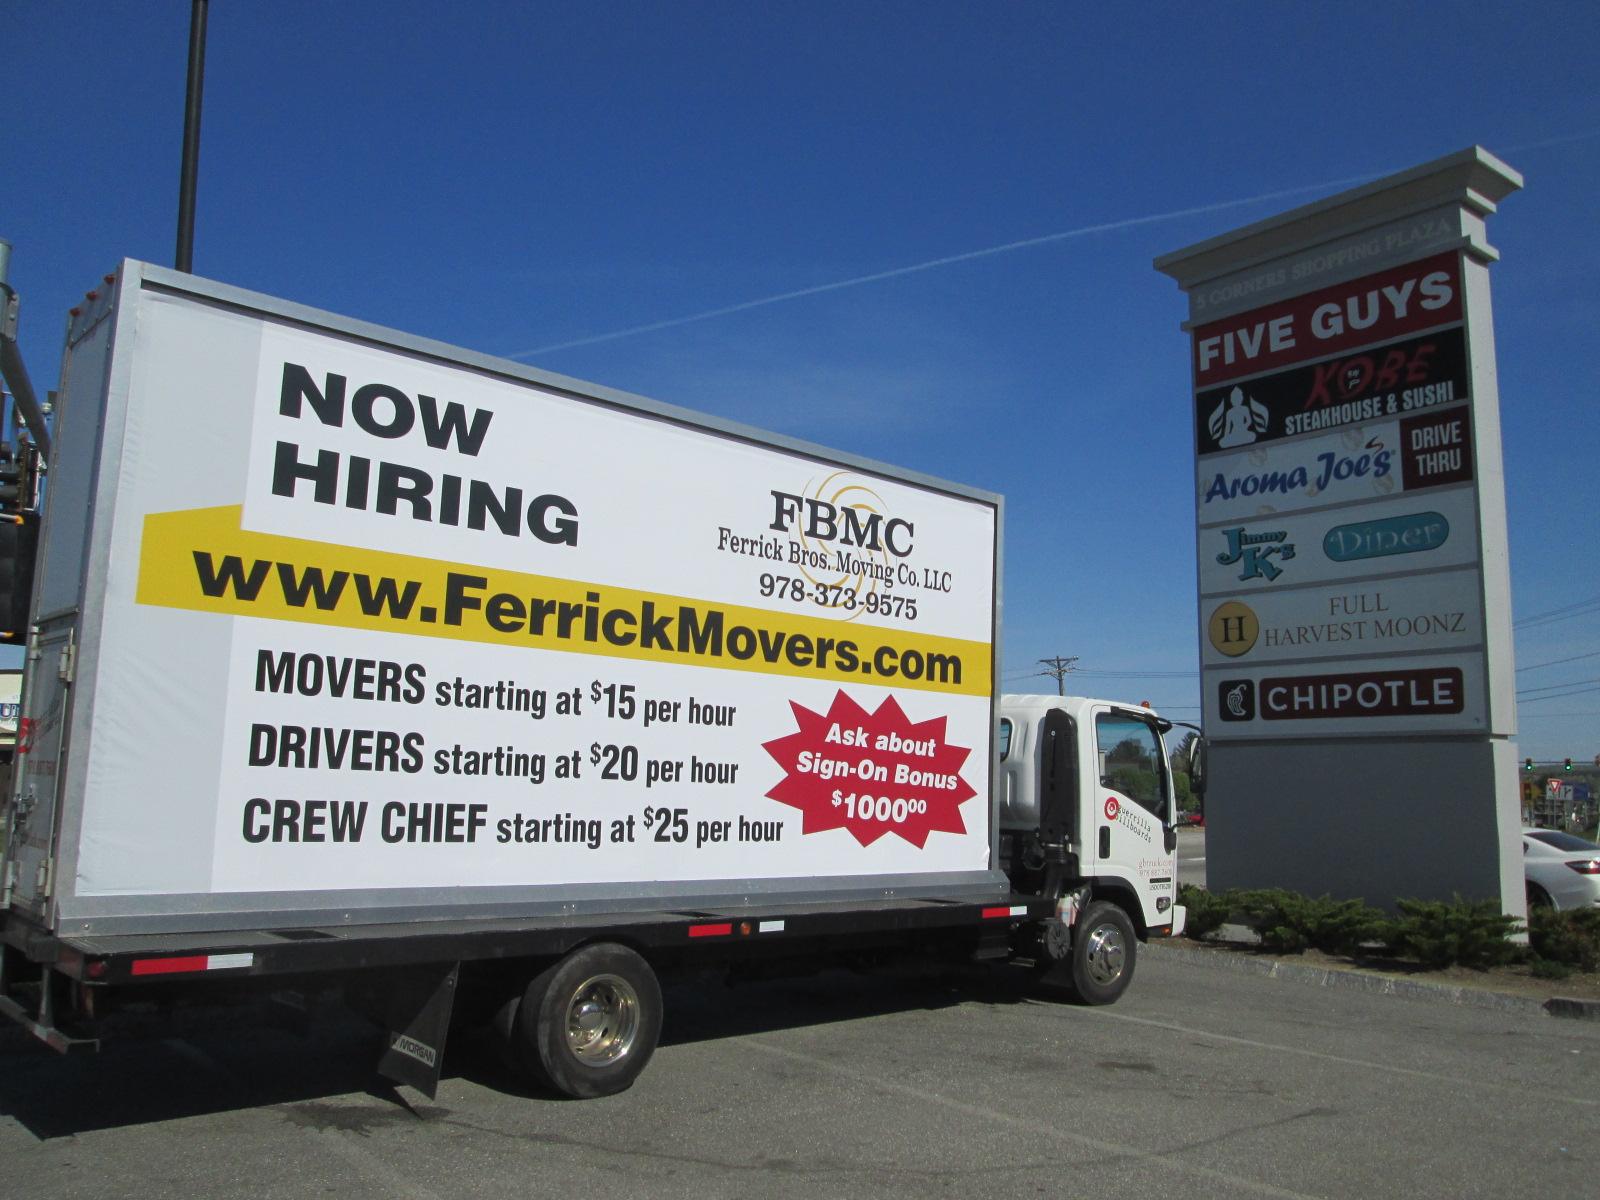 Mobile billboard truck at 5 Corners Shopping Plaza in Haverhill MA